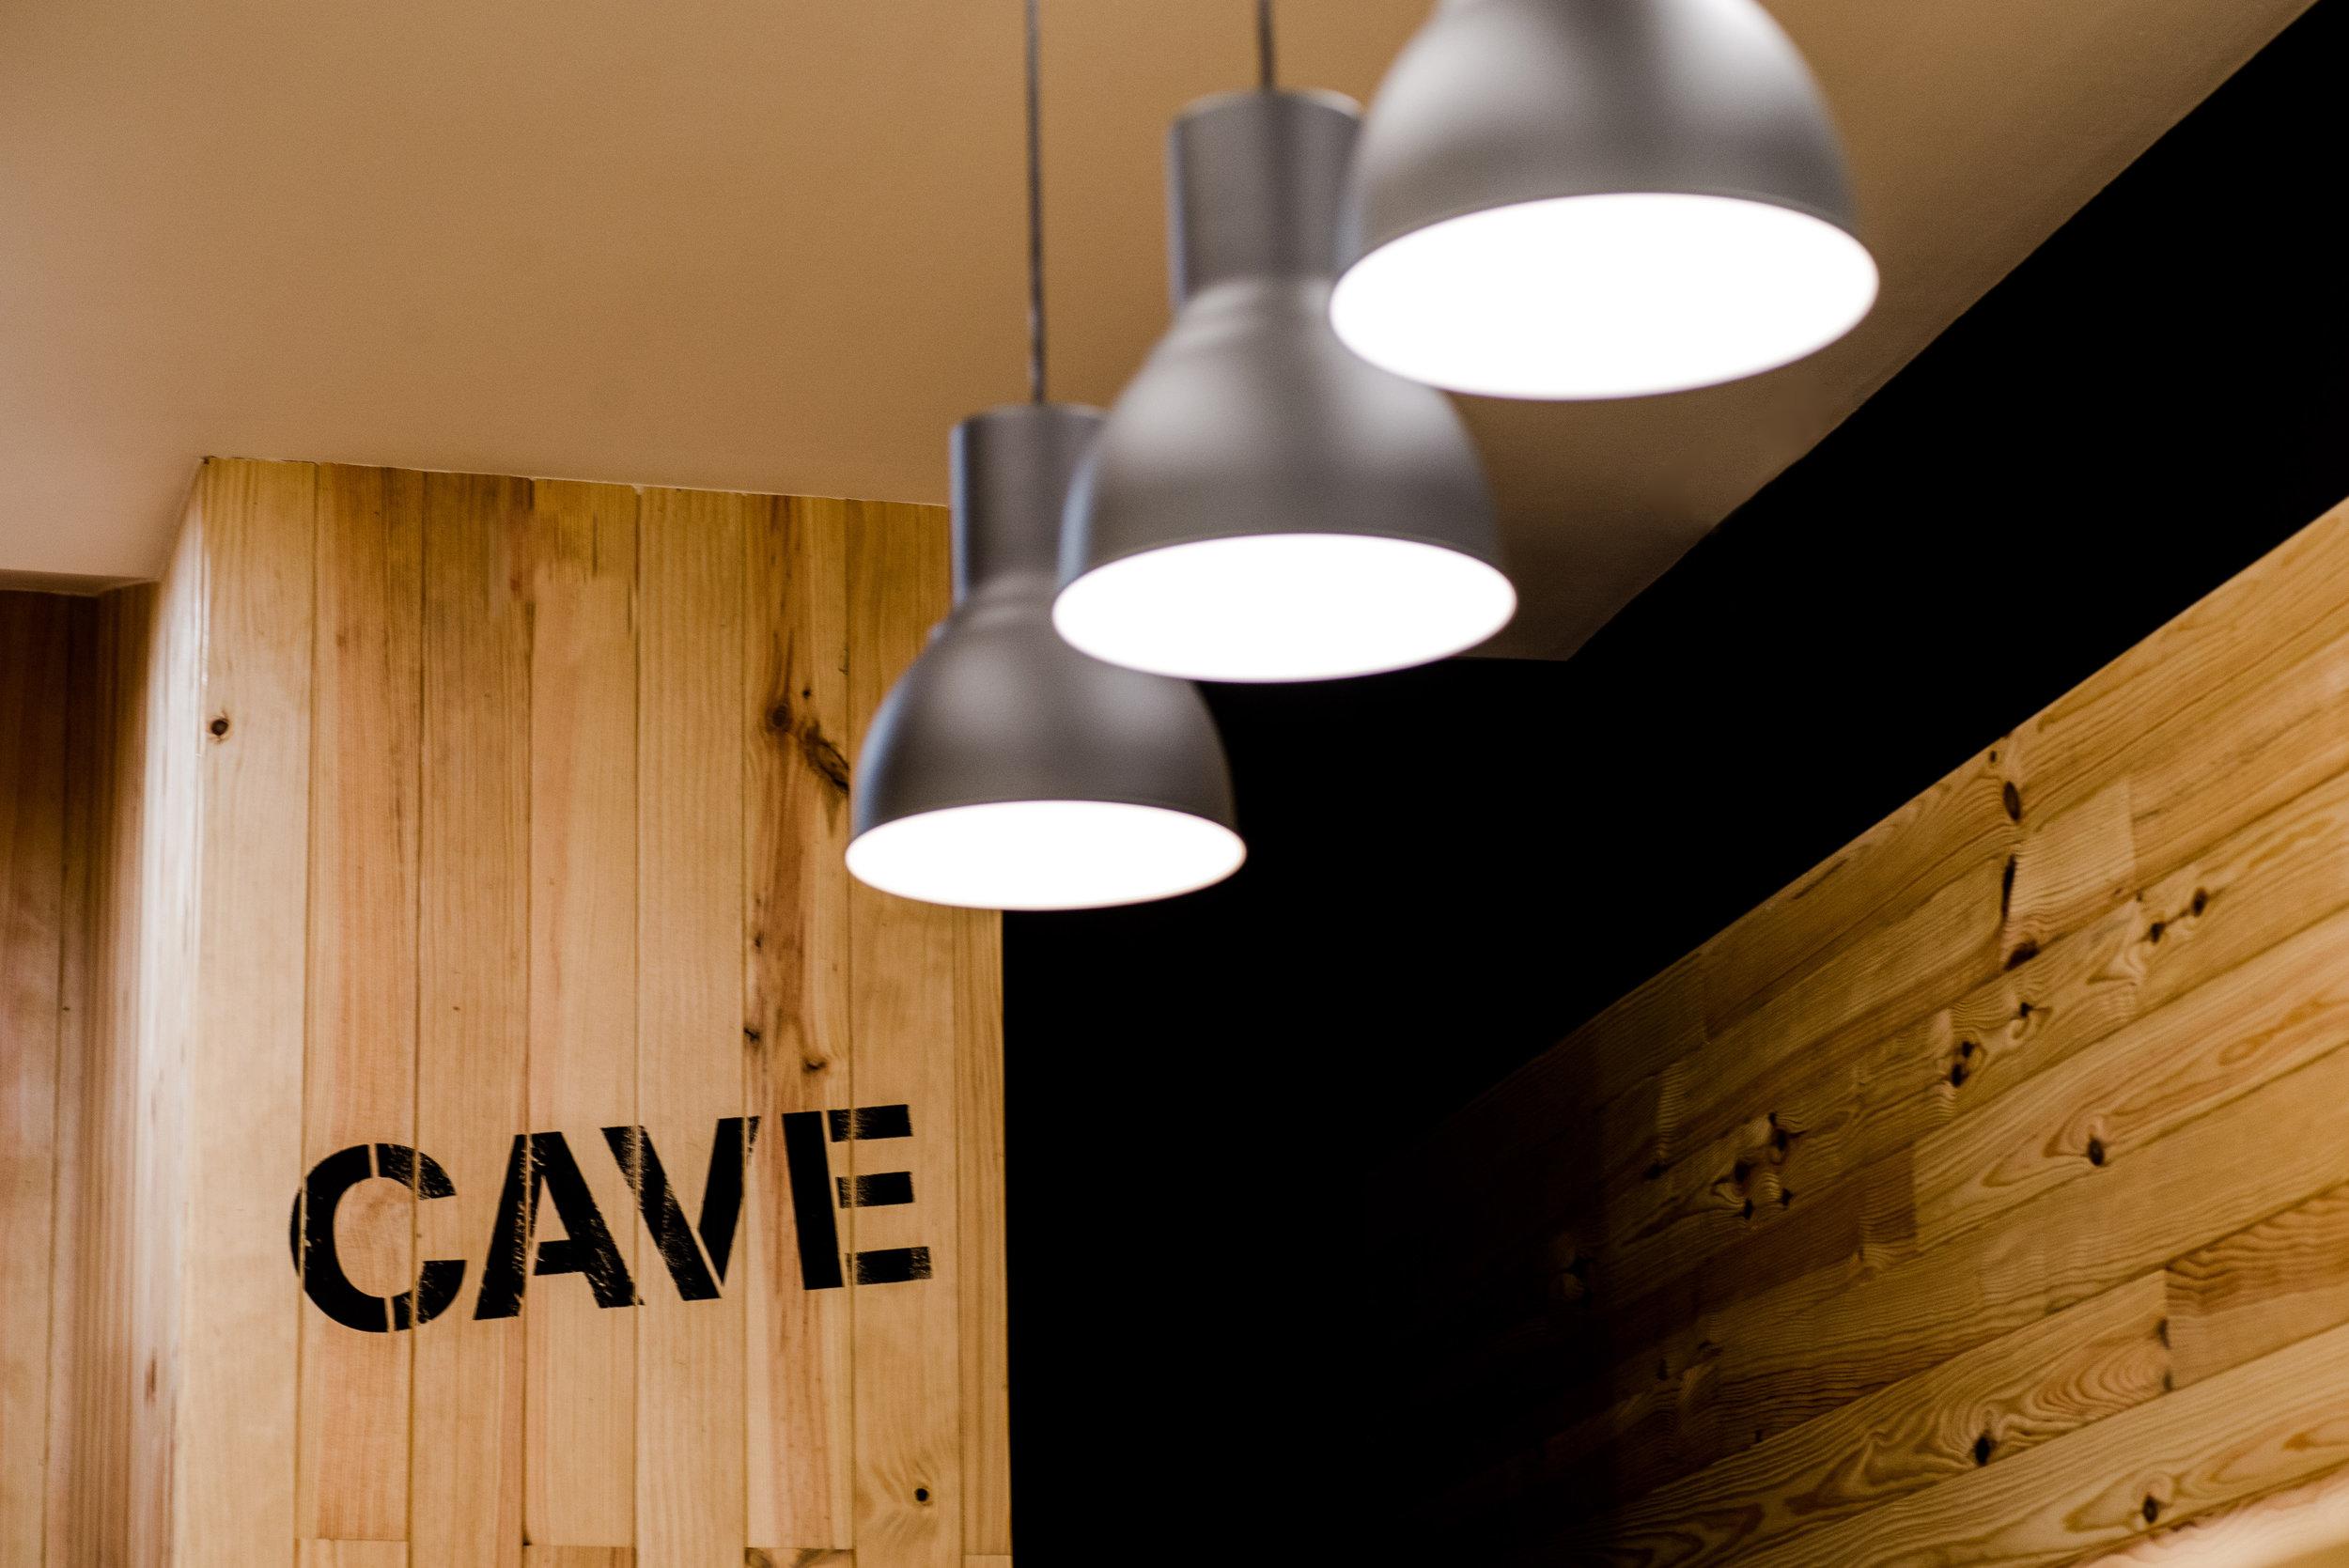 Cave 158-43.jpg